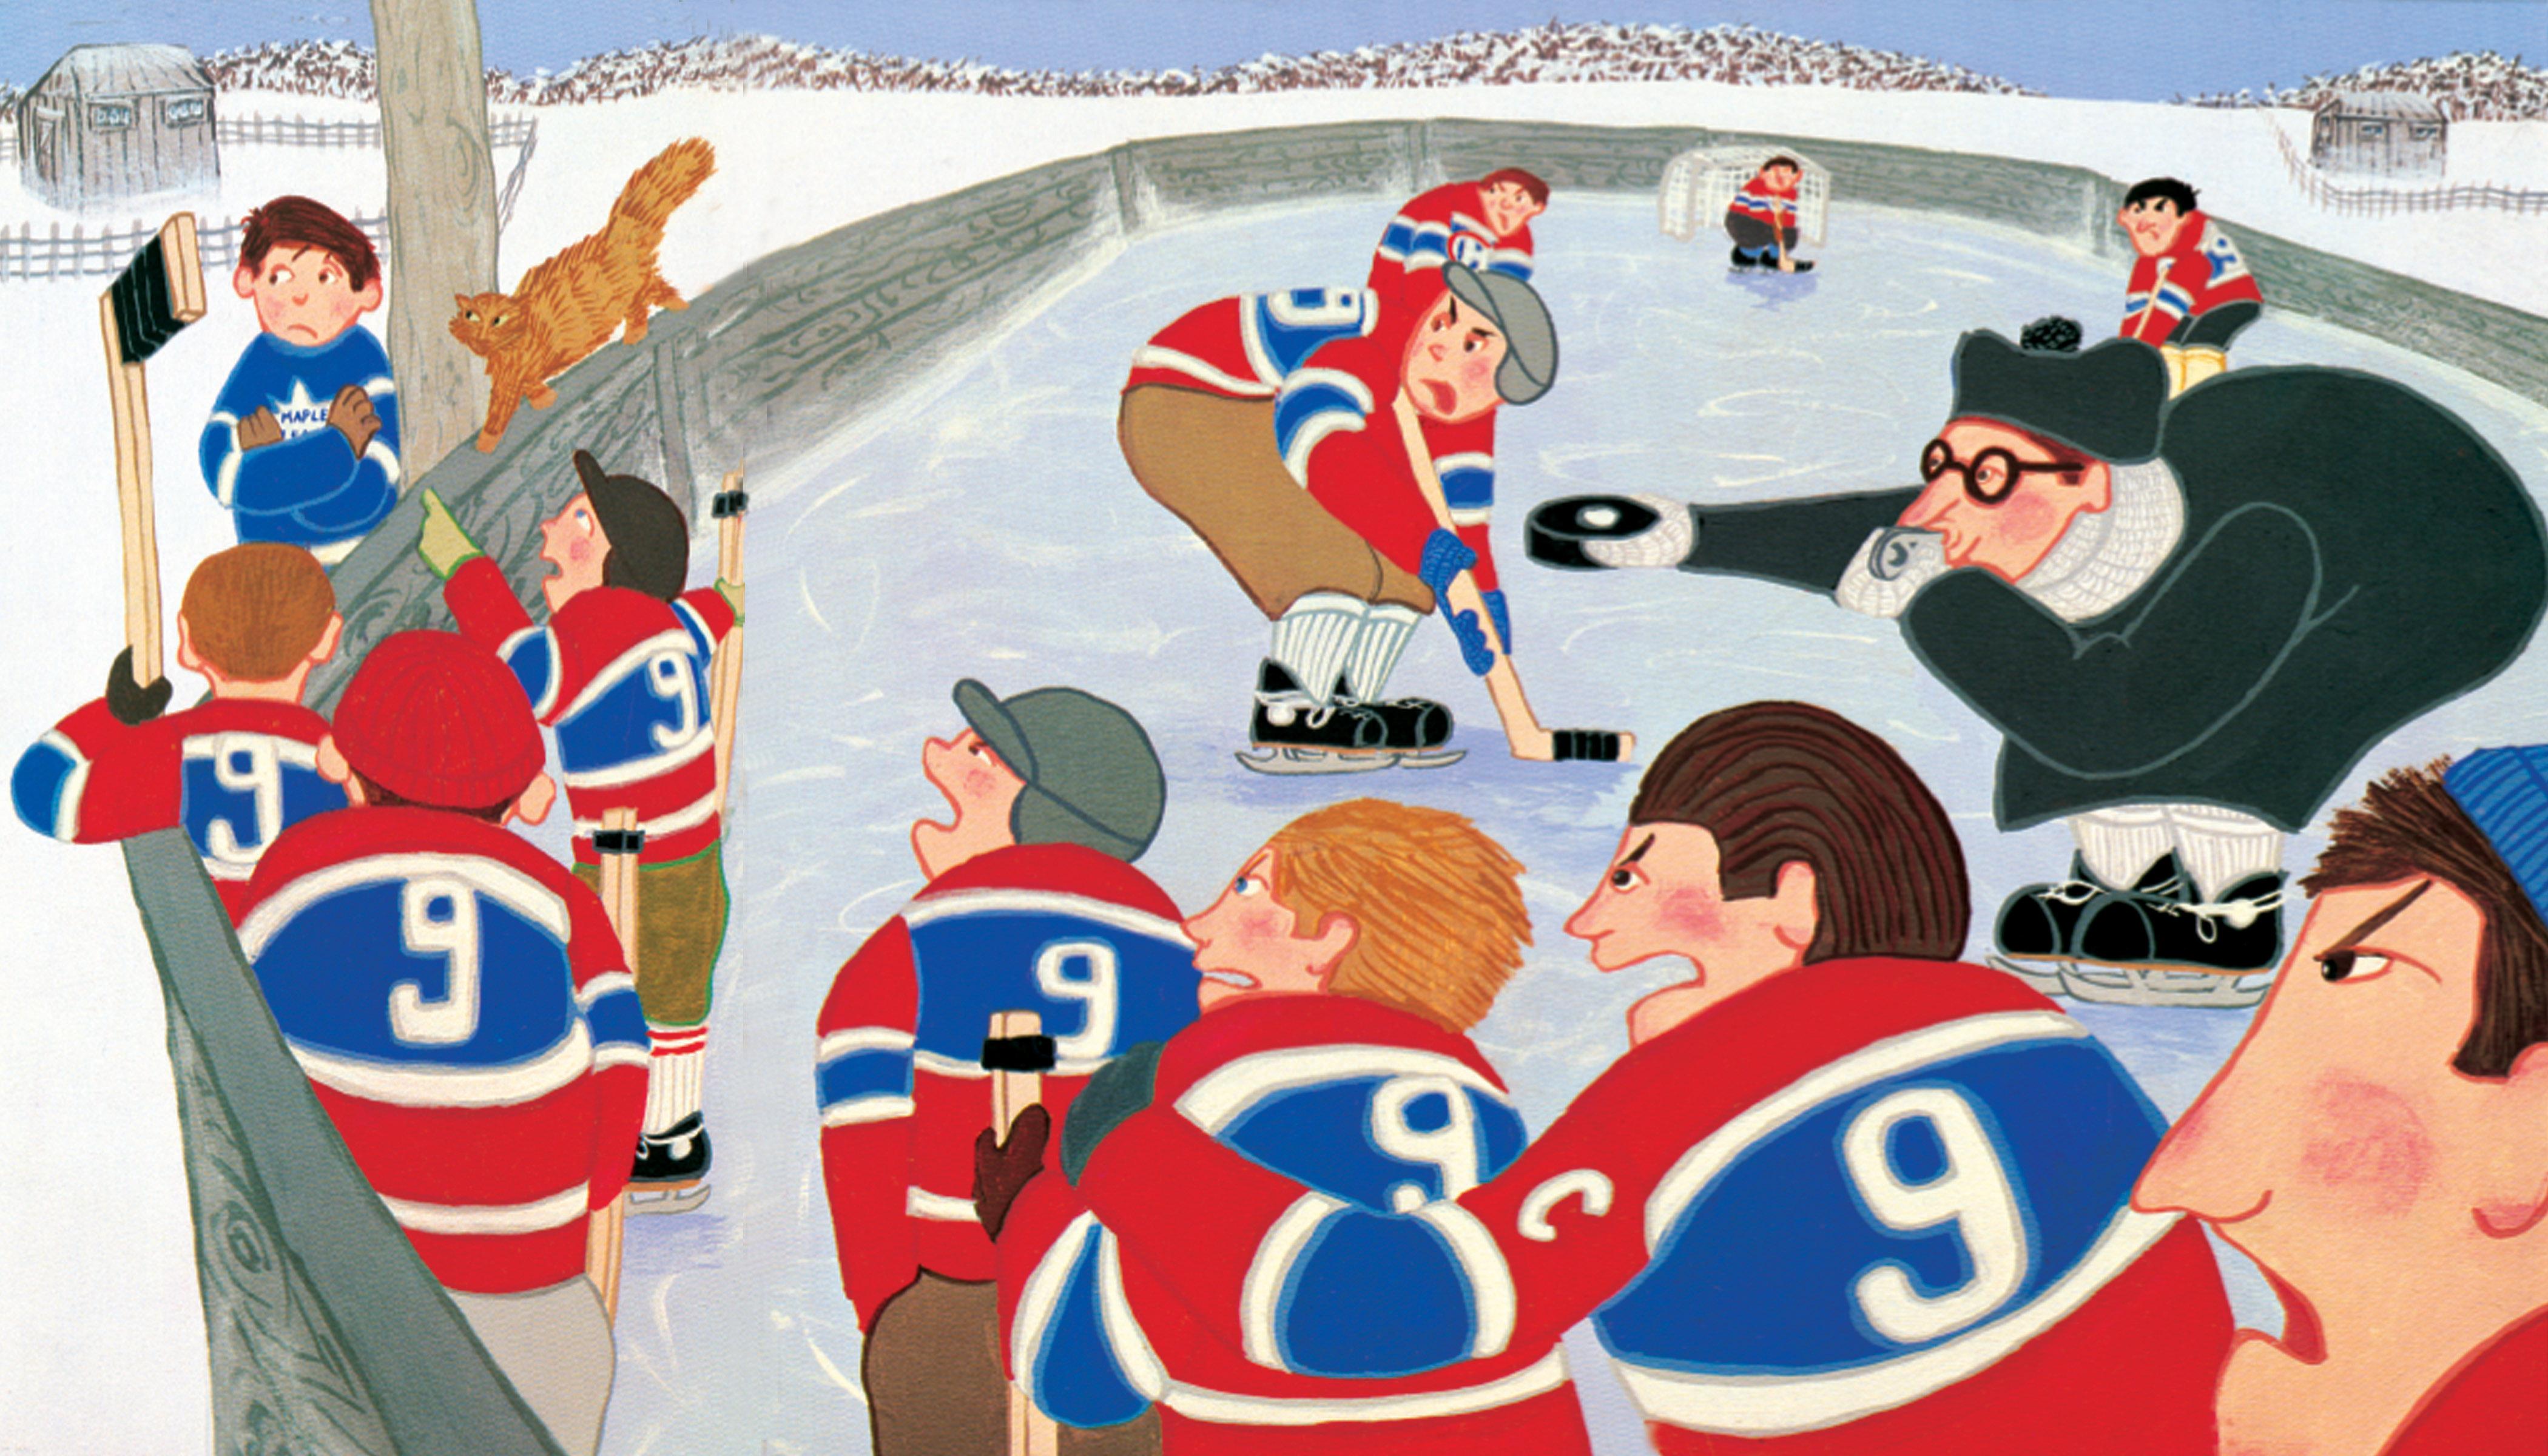 детский хоккей, Уэйн Гретцки, НХЛ, книги, Монреаль, Торонто, Морис Ришар, Калгари, Питерборо